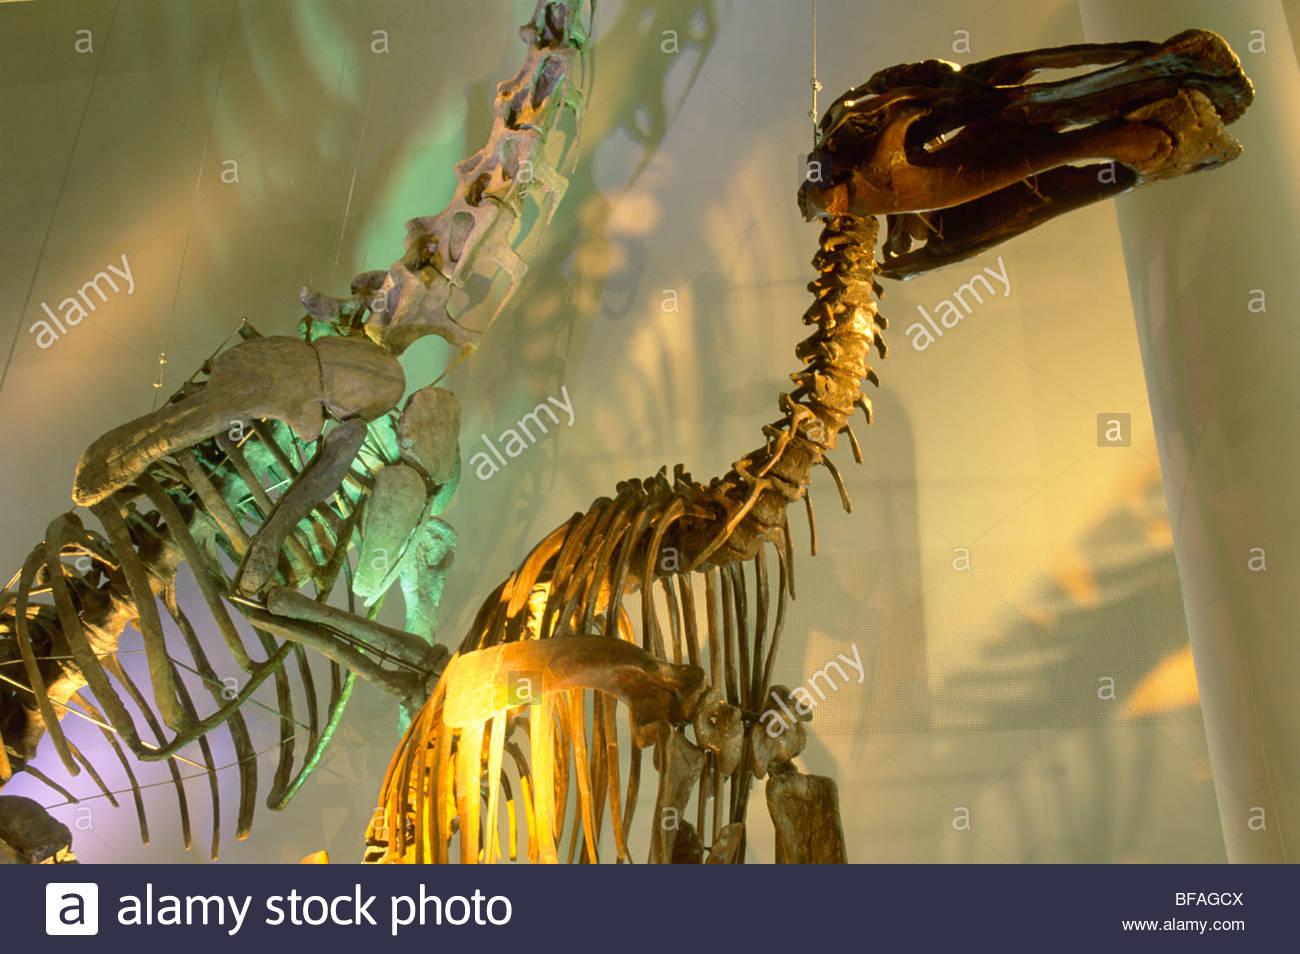 Duck-billed dinosaur skeletons, Naturalis the National Museum of Natural History, Leiden, Netherlands - Stock Image